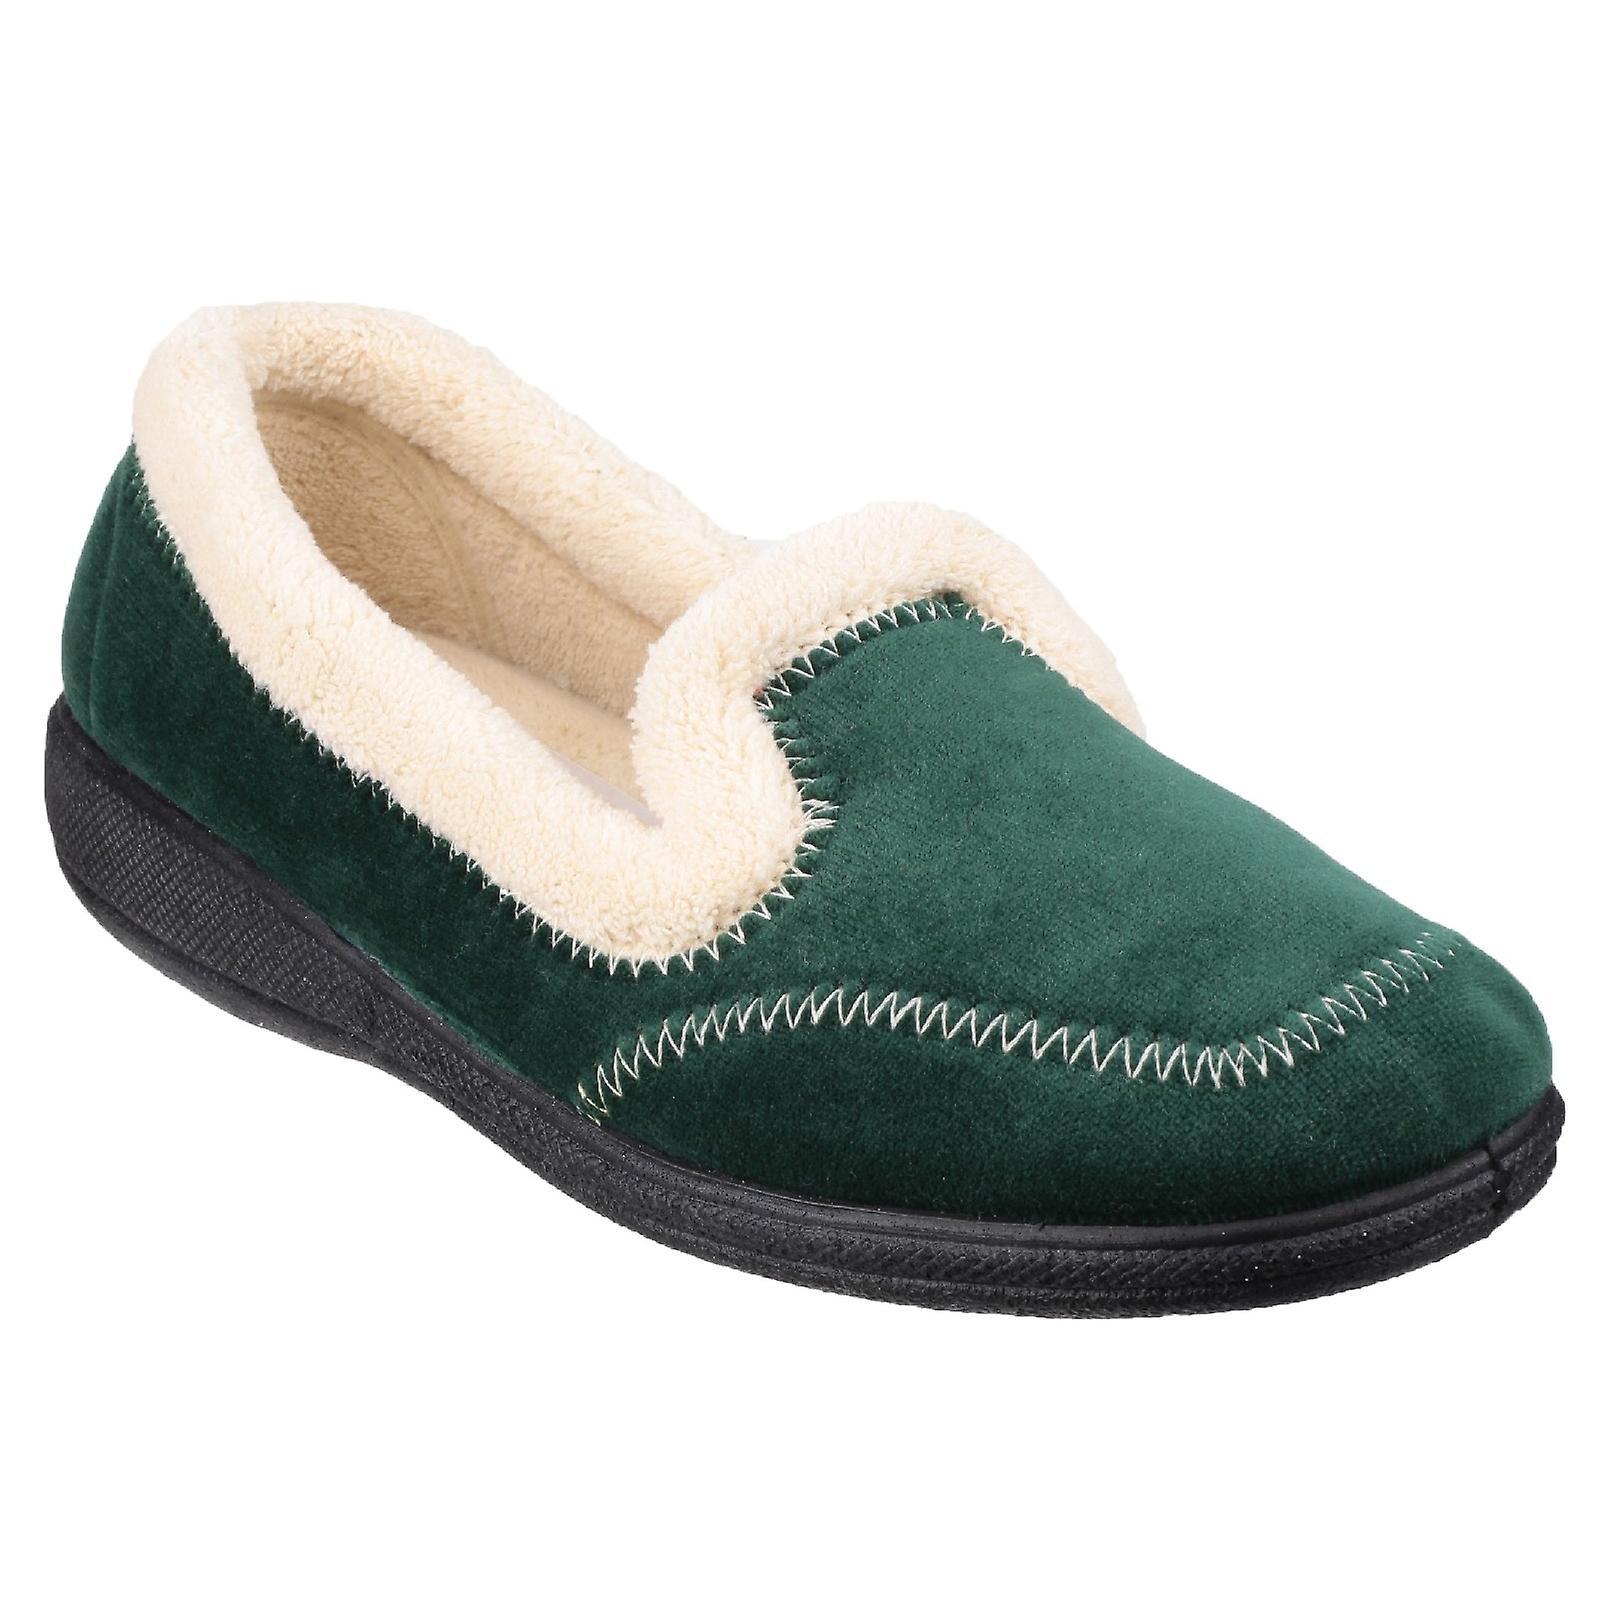 Fleet & Foster Womens/Ladies Maier Classic Slippers